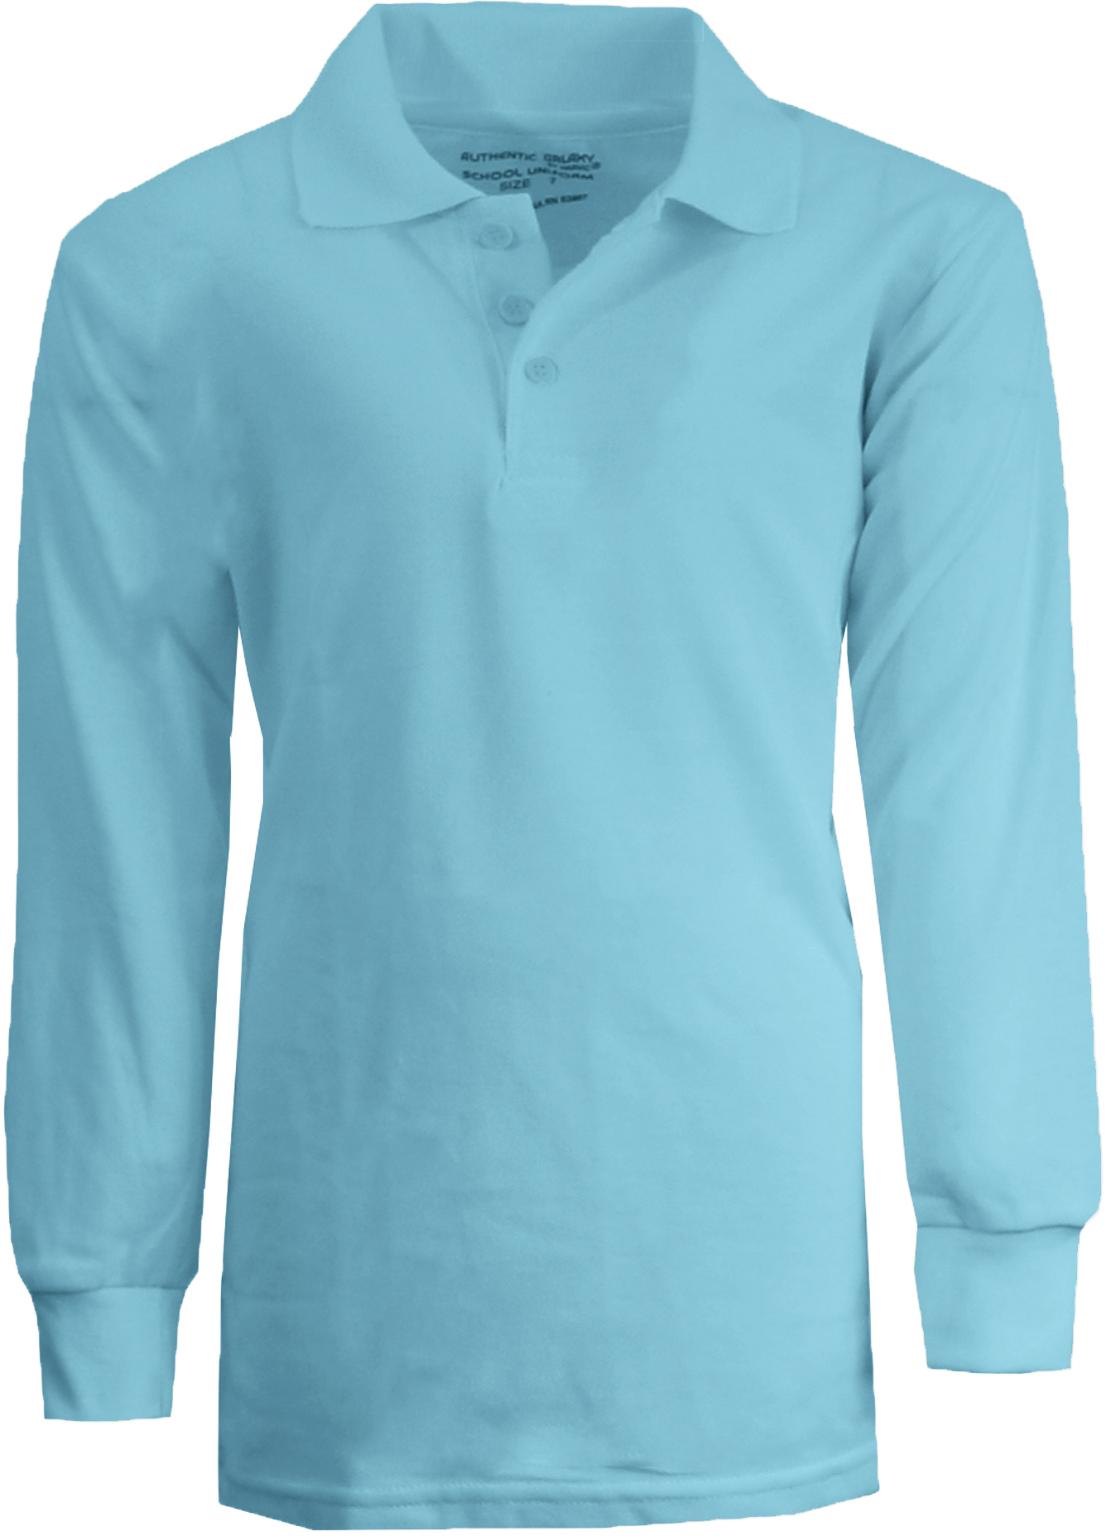 Wholesale boy 39 s light blue long sleeve pique polo shirts for Light brown polo shirt